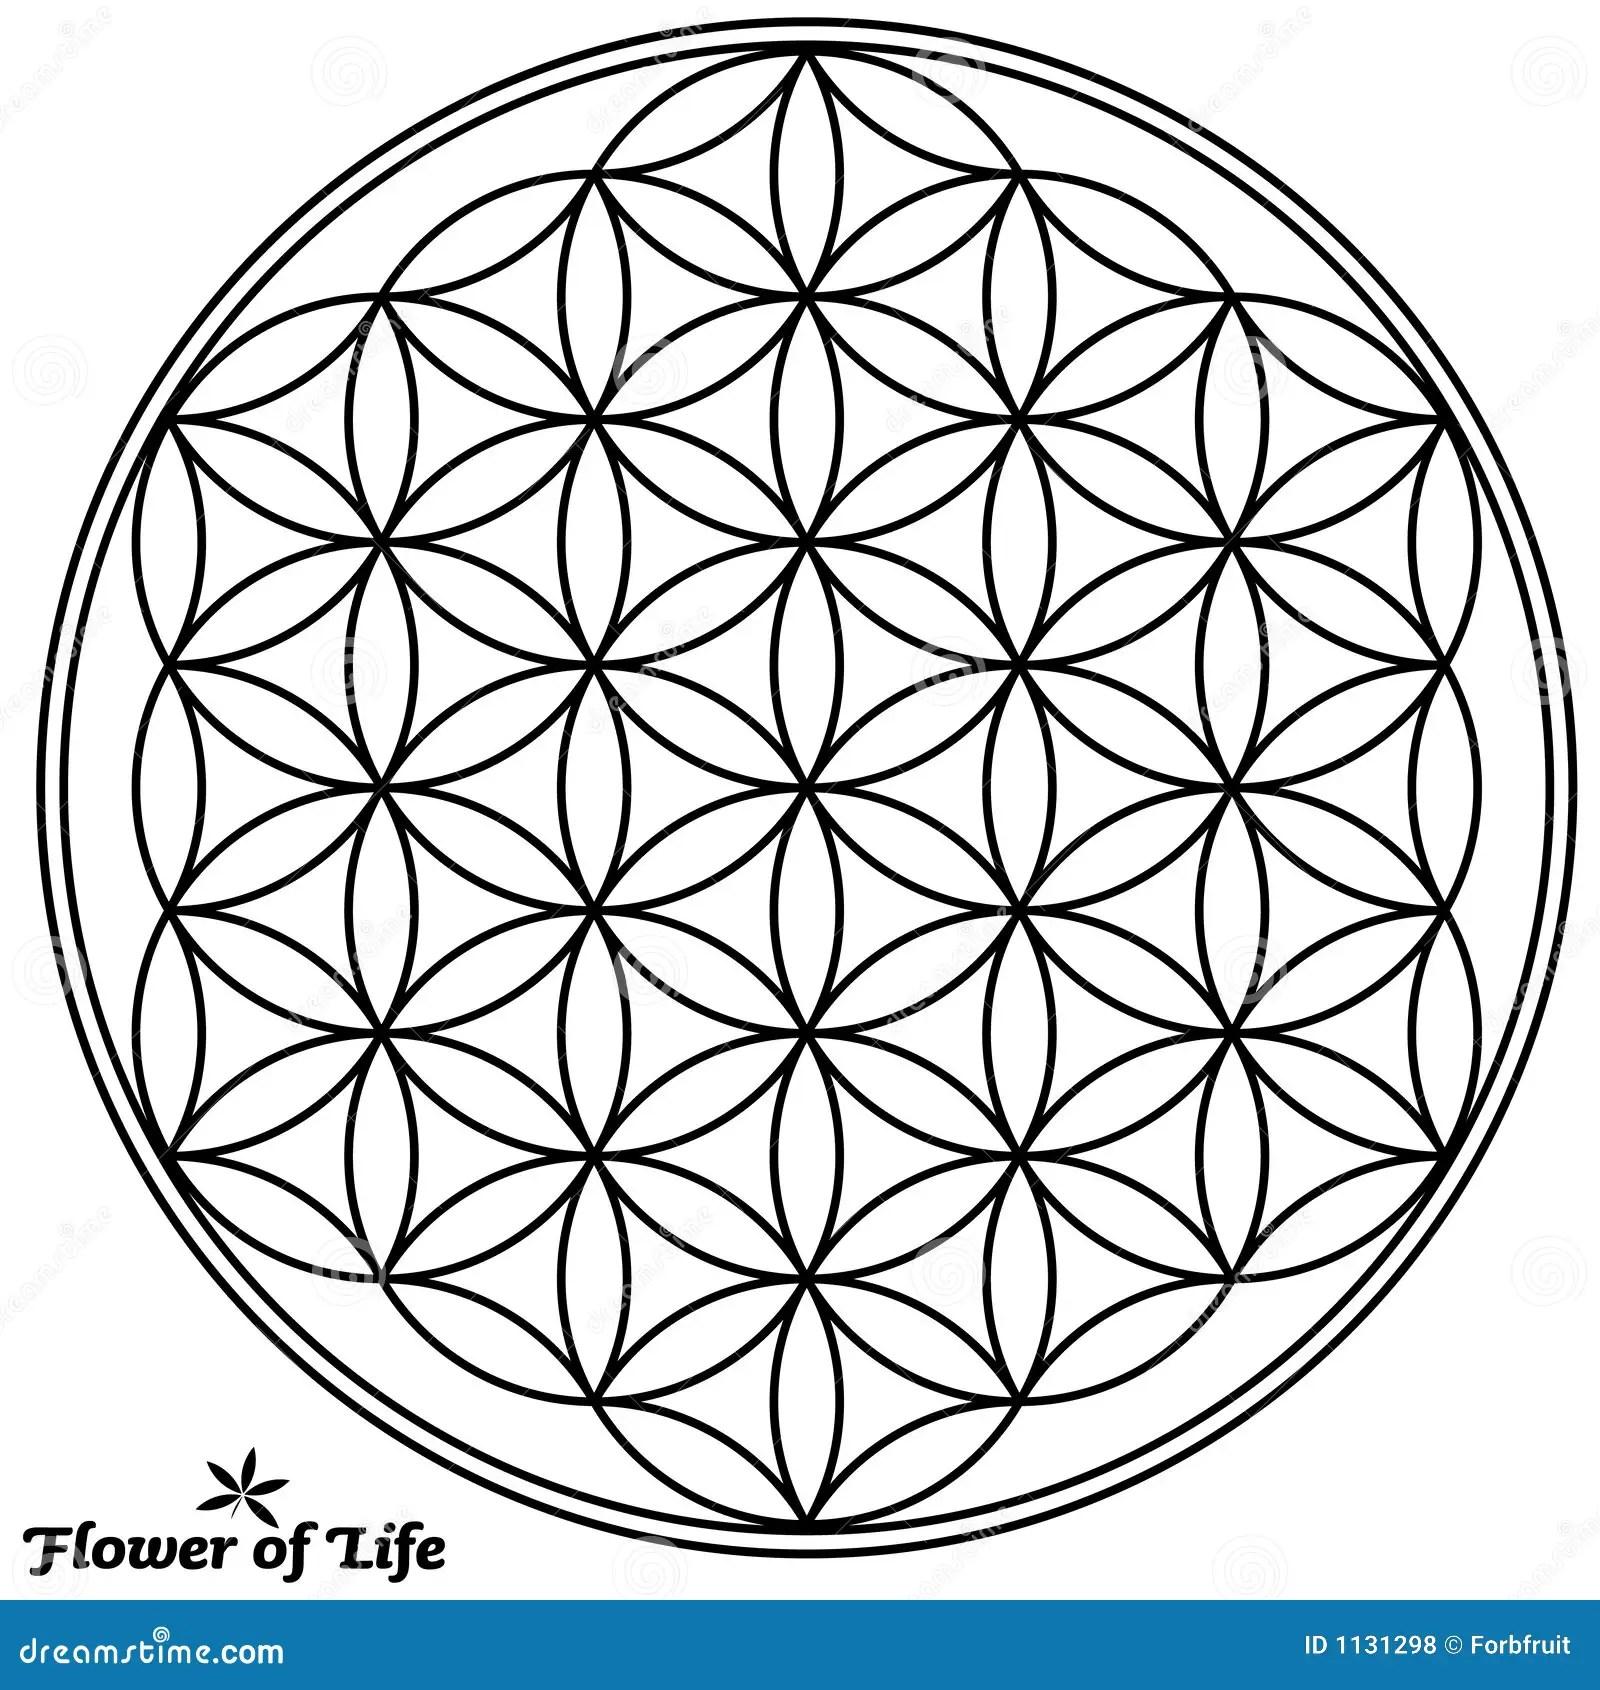 Flower Of Life Yin Yang Spheres Cartoon Vector